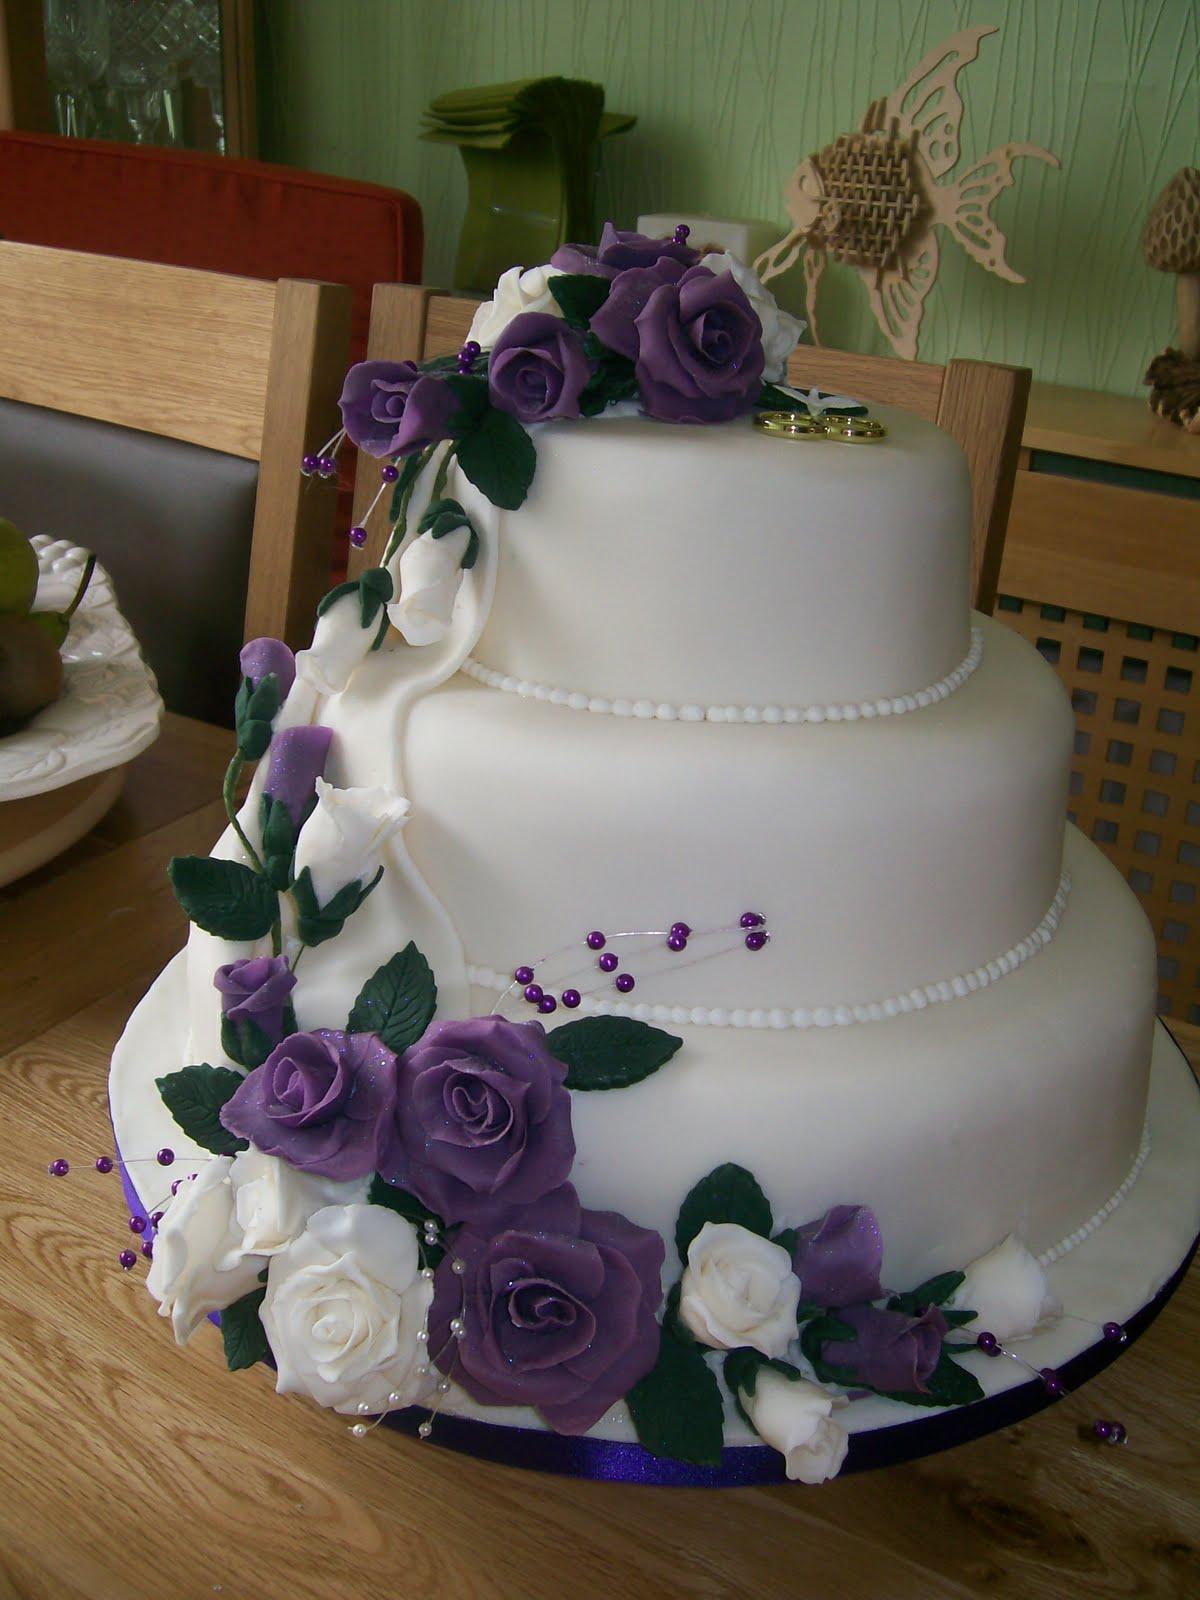 http://4.bp.blogspot.com/-KoJTt7nOYSM/TmPs8w6wE4I/AAAAAAAAAAk/bDyMF7CyTRk/s1600/cake1.jpg